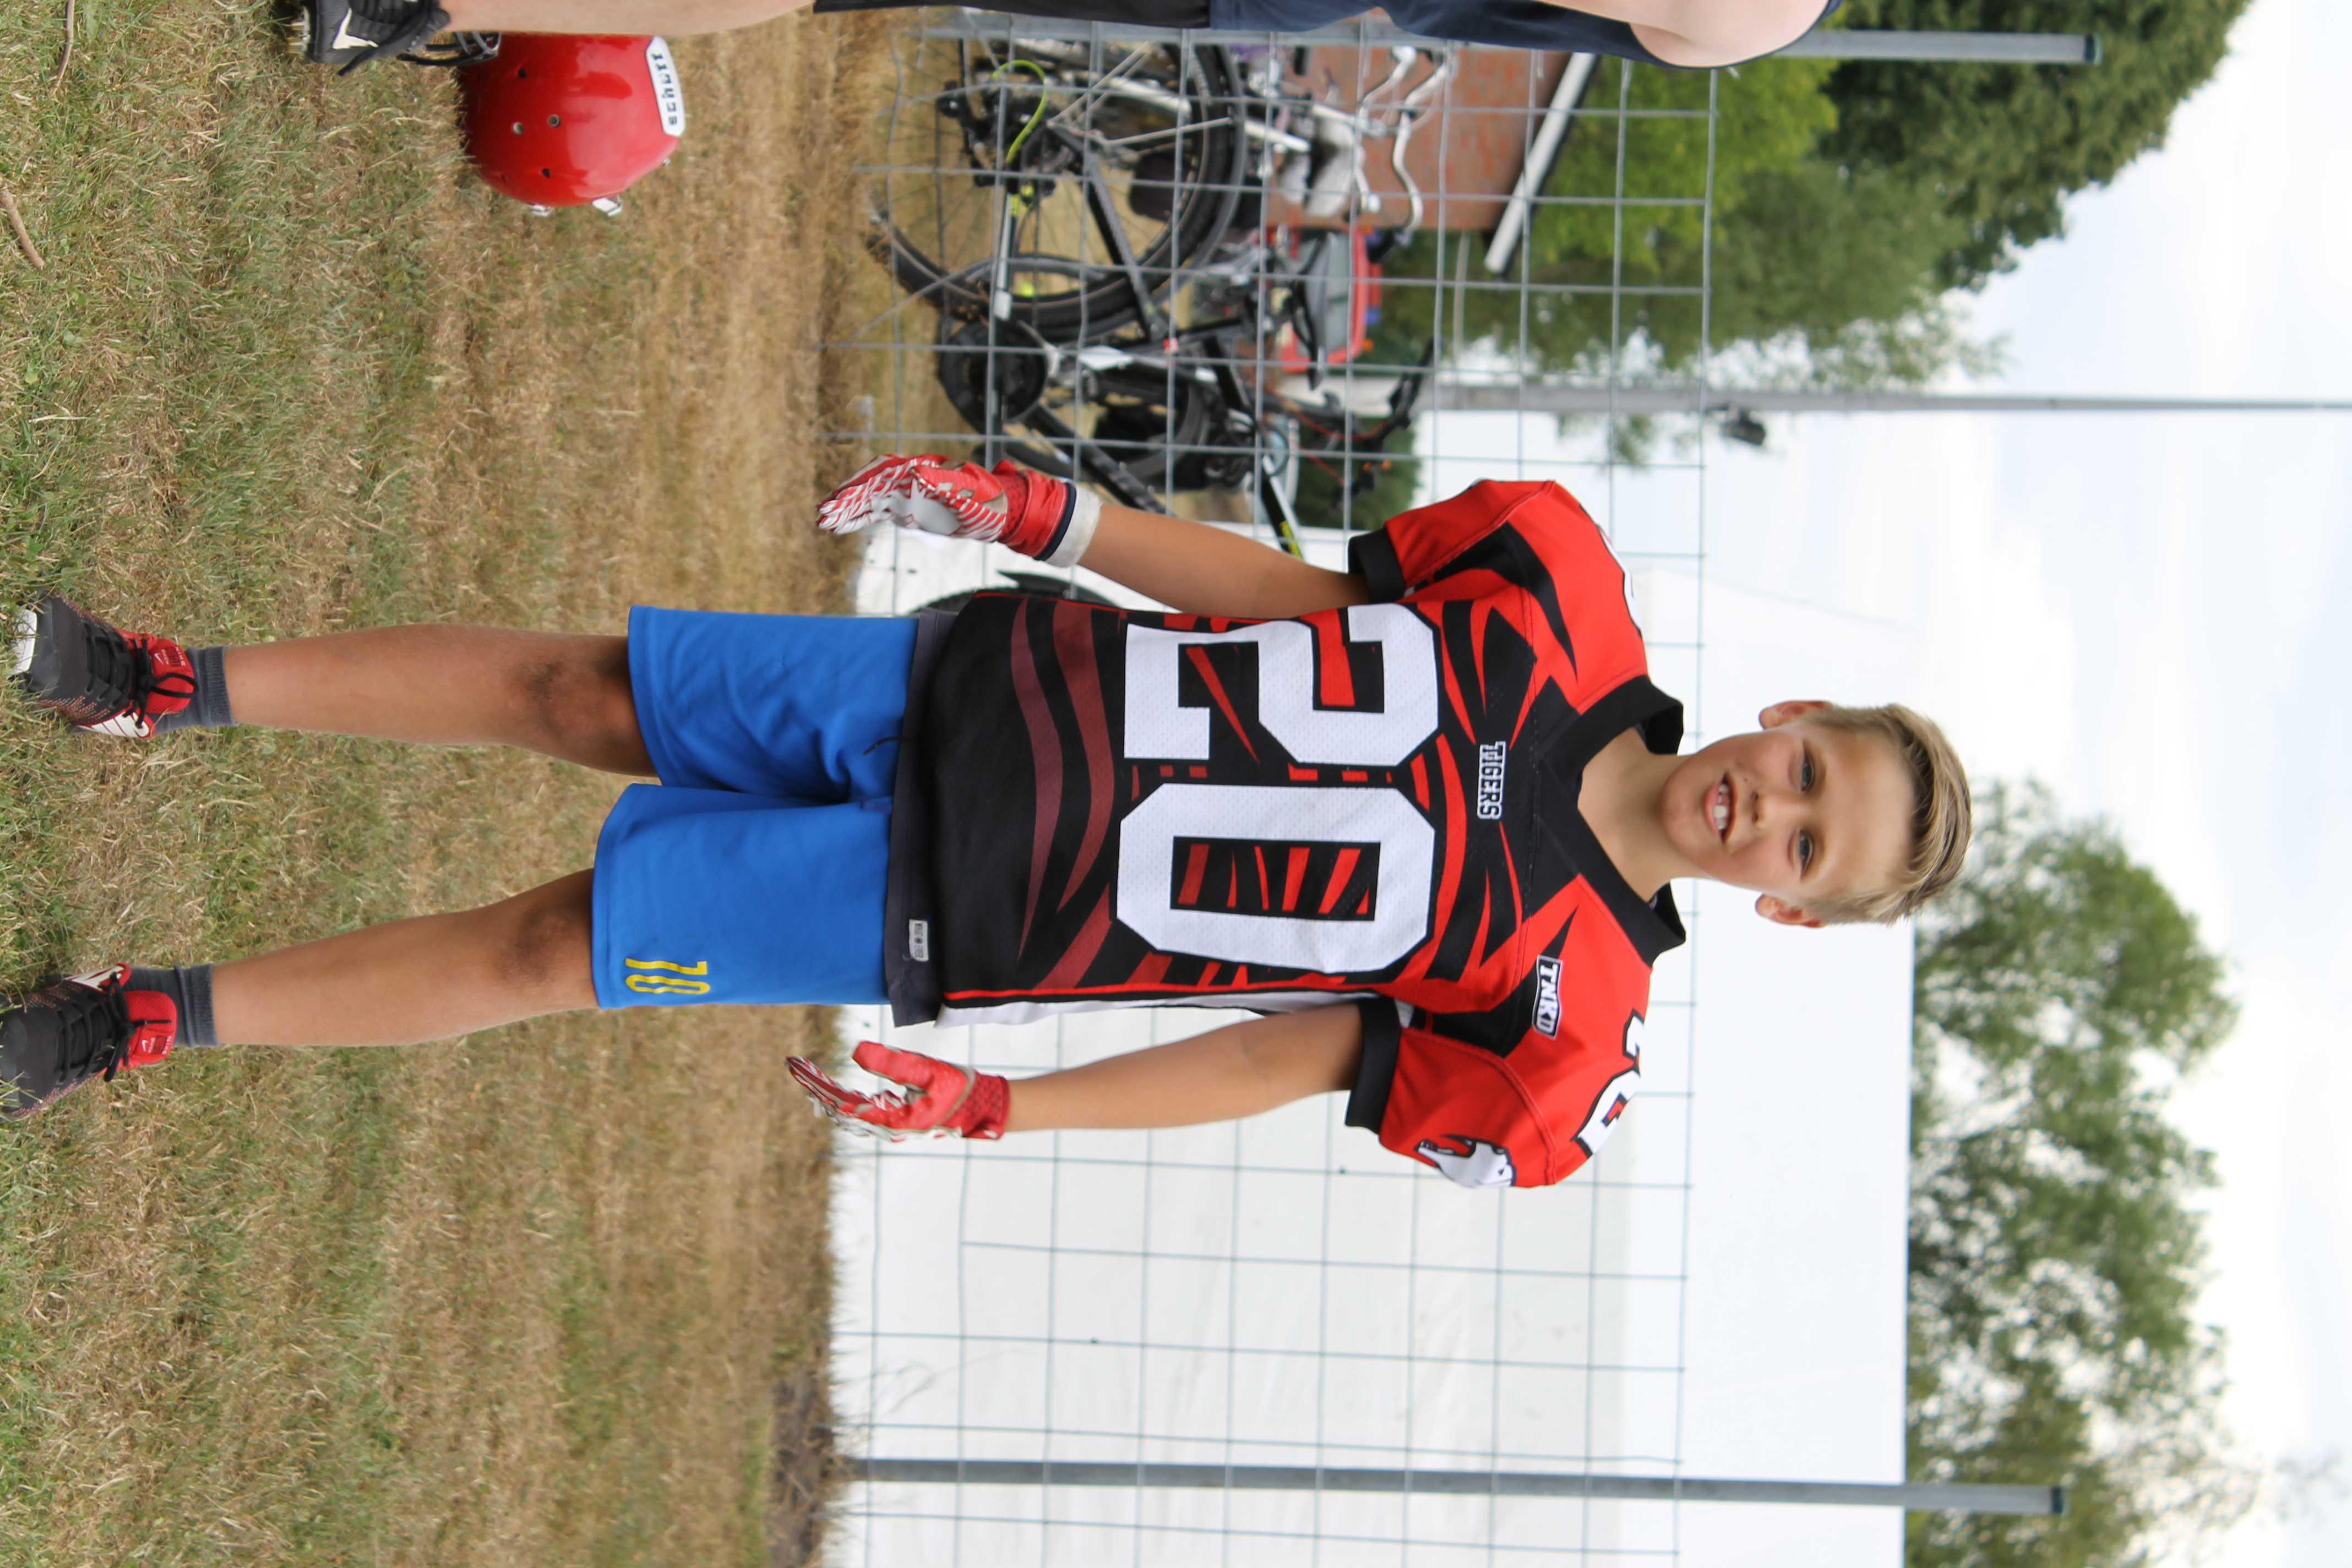 2018-07-29 Sportwoche - Sportpicknick & Football & Fußball (93)